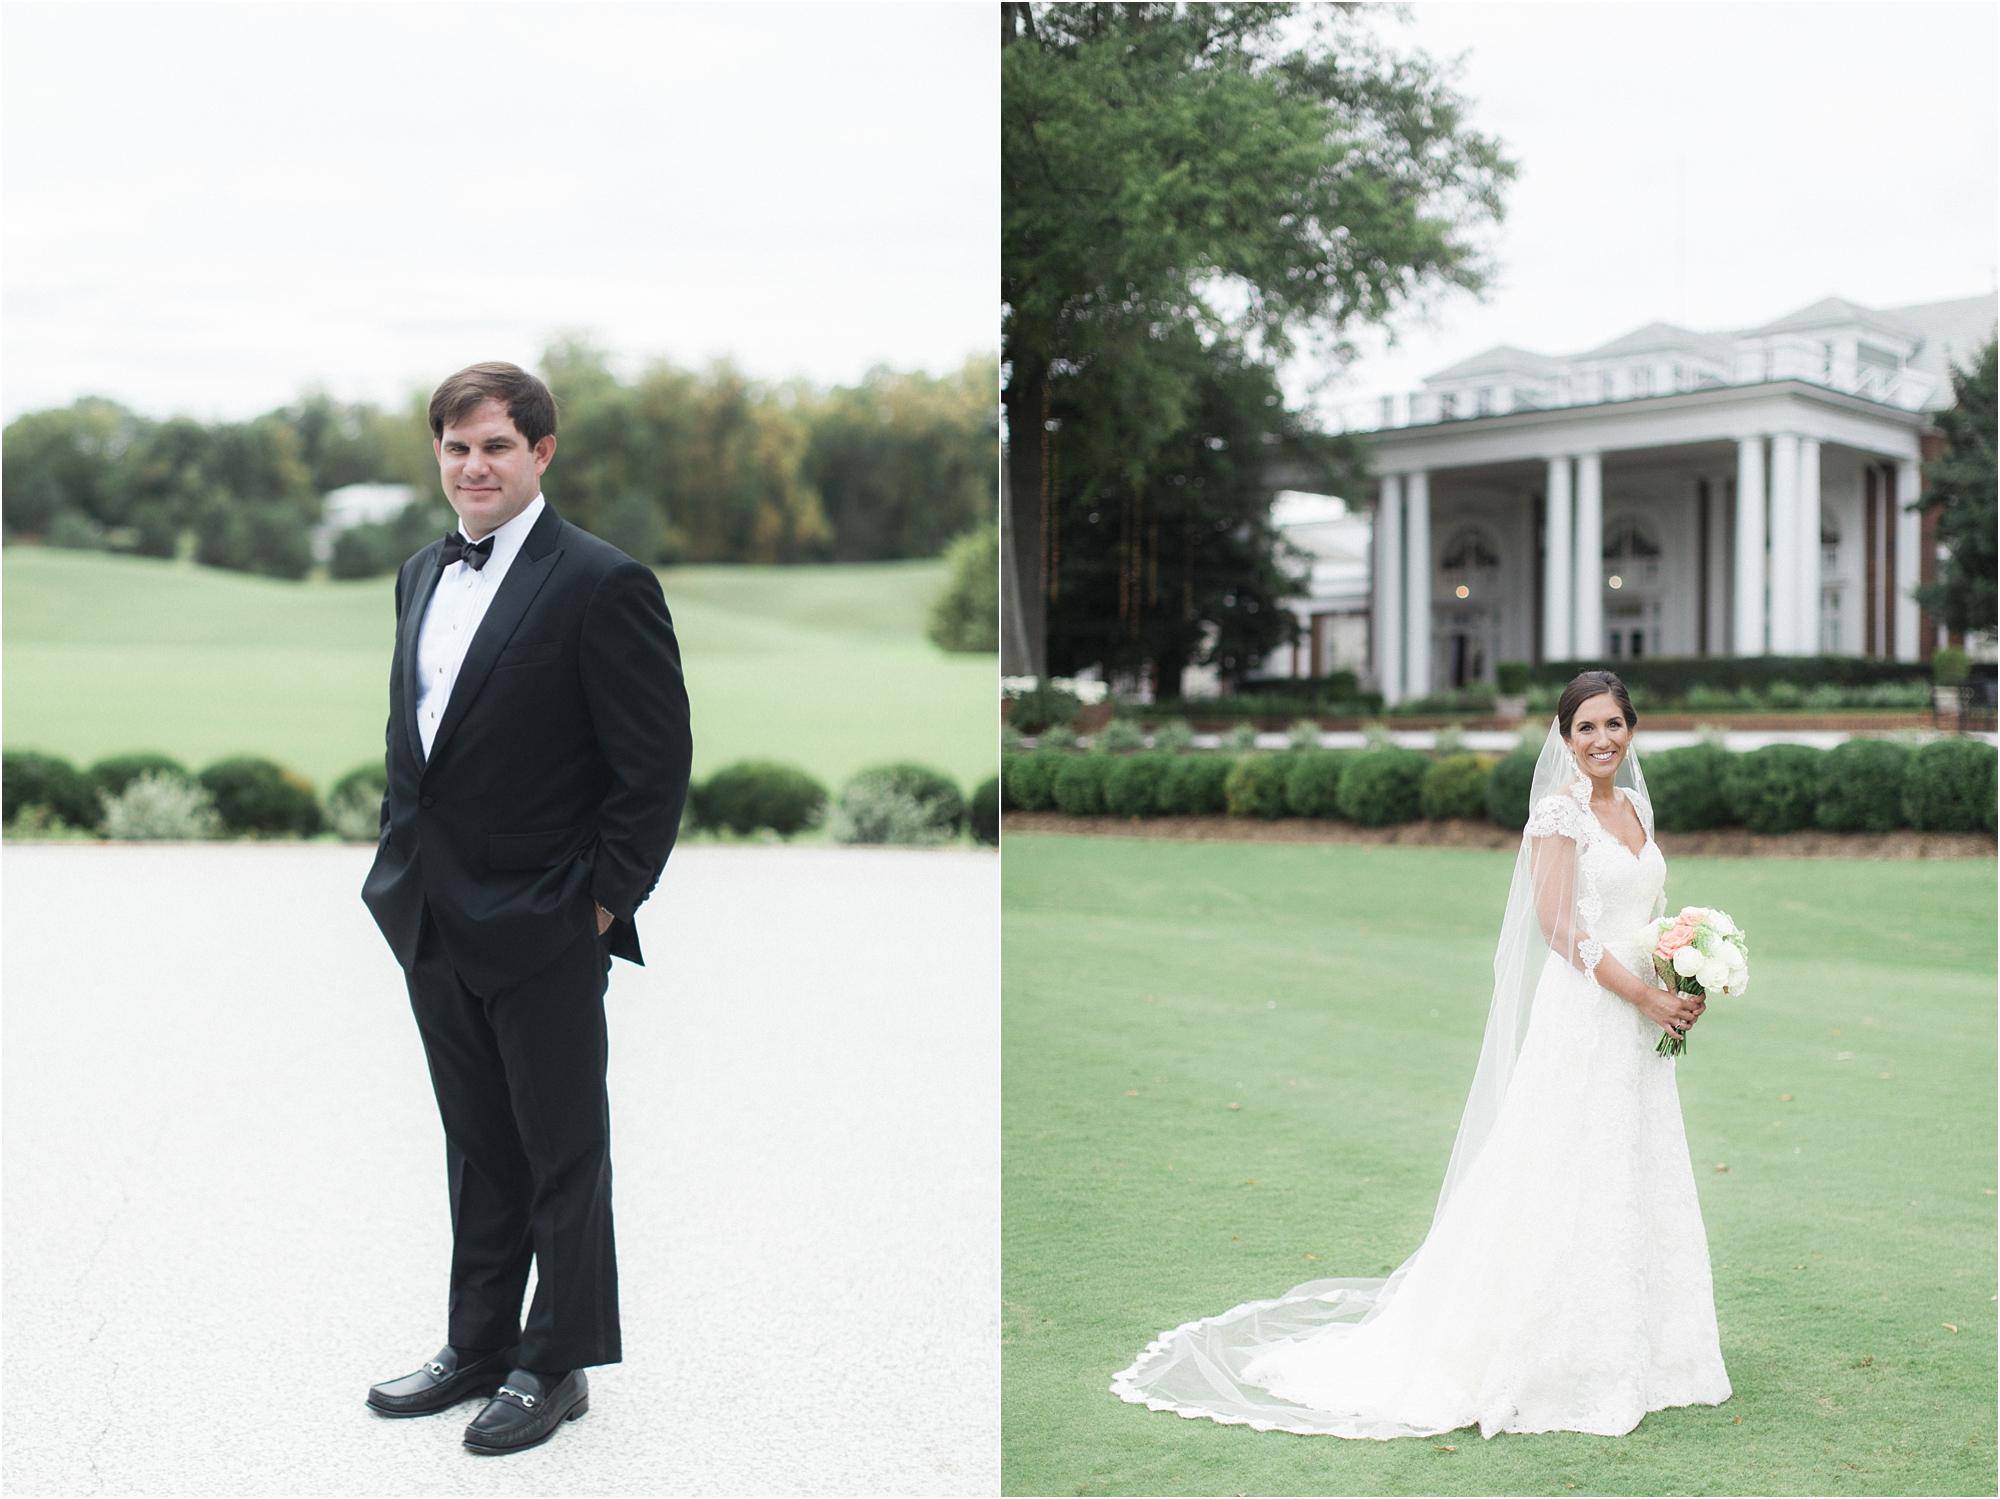 stephanie-yonce-photography-richmond-virginia-country-club-wedding-photo_012.JPG